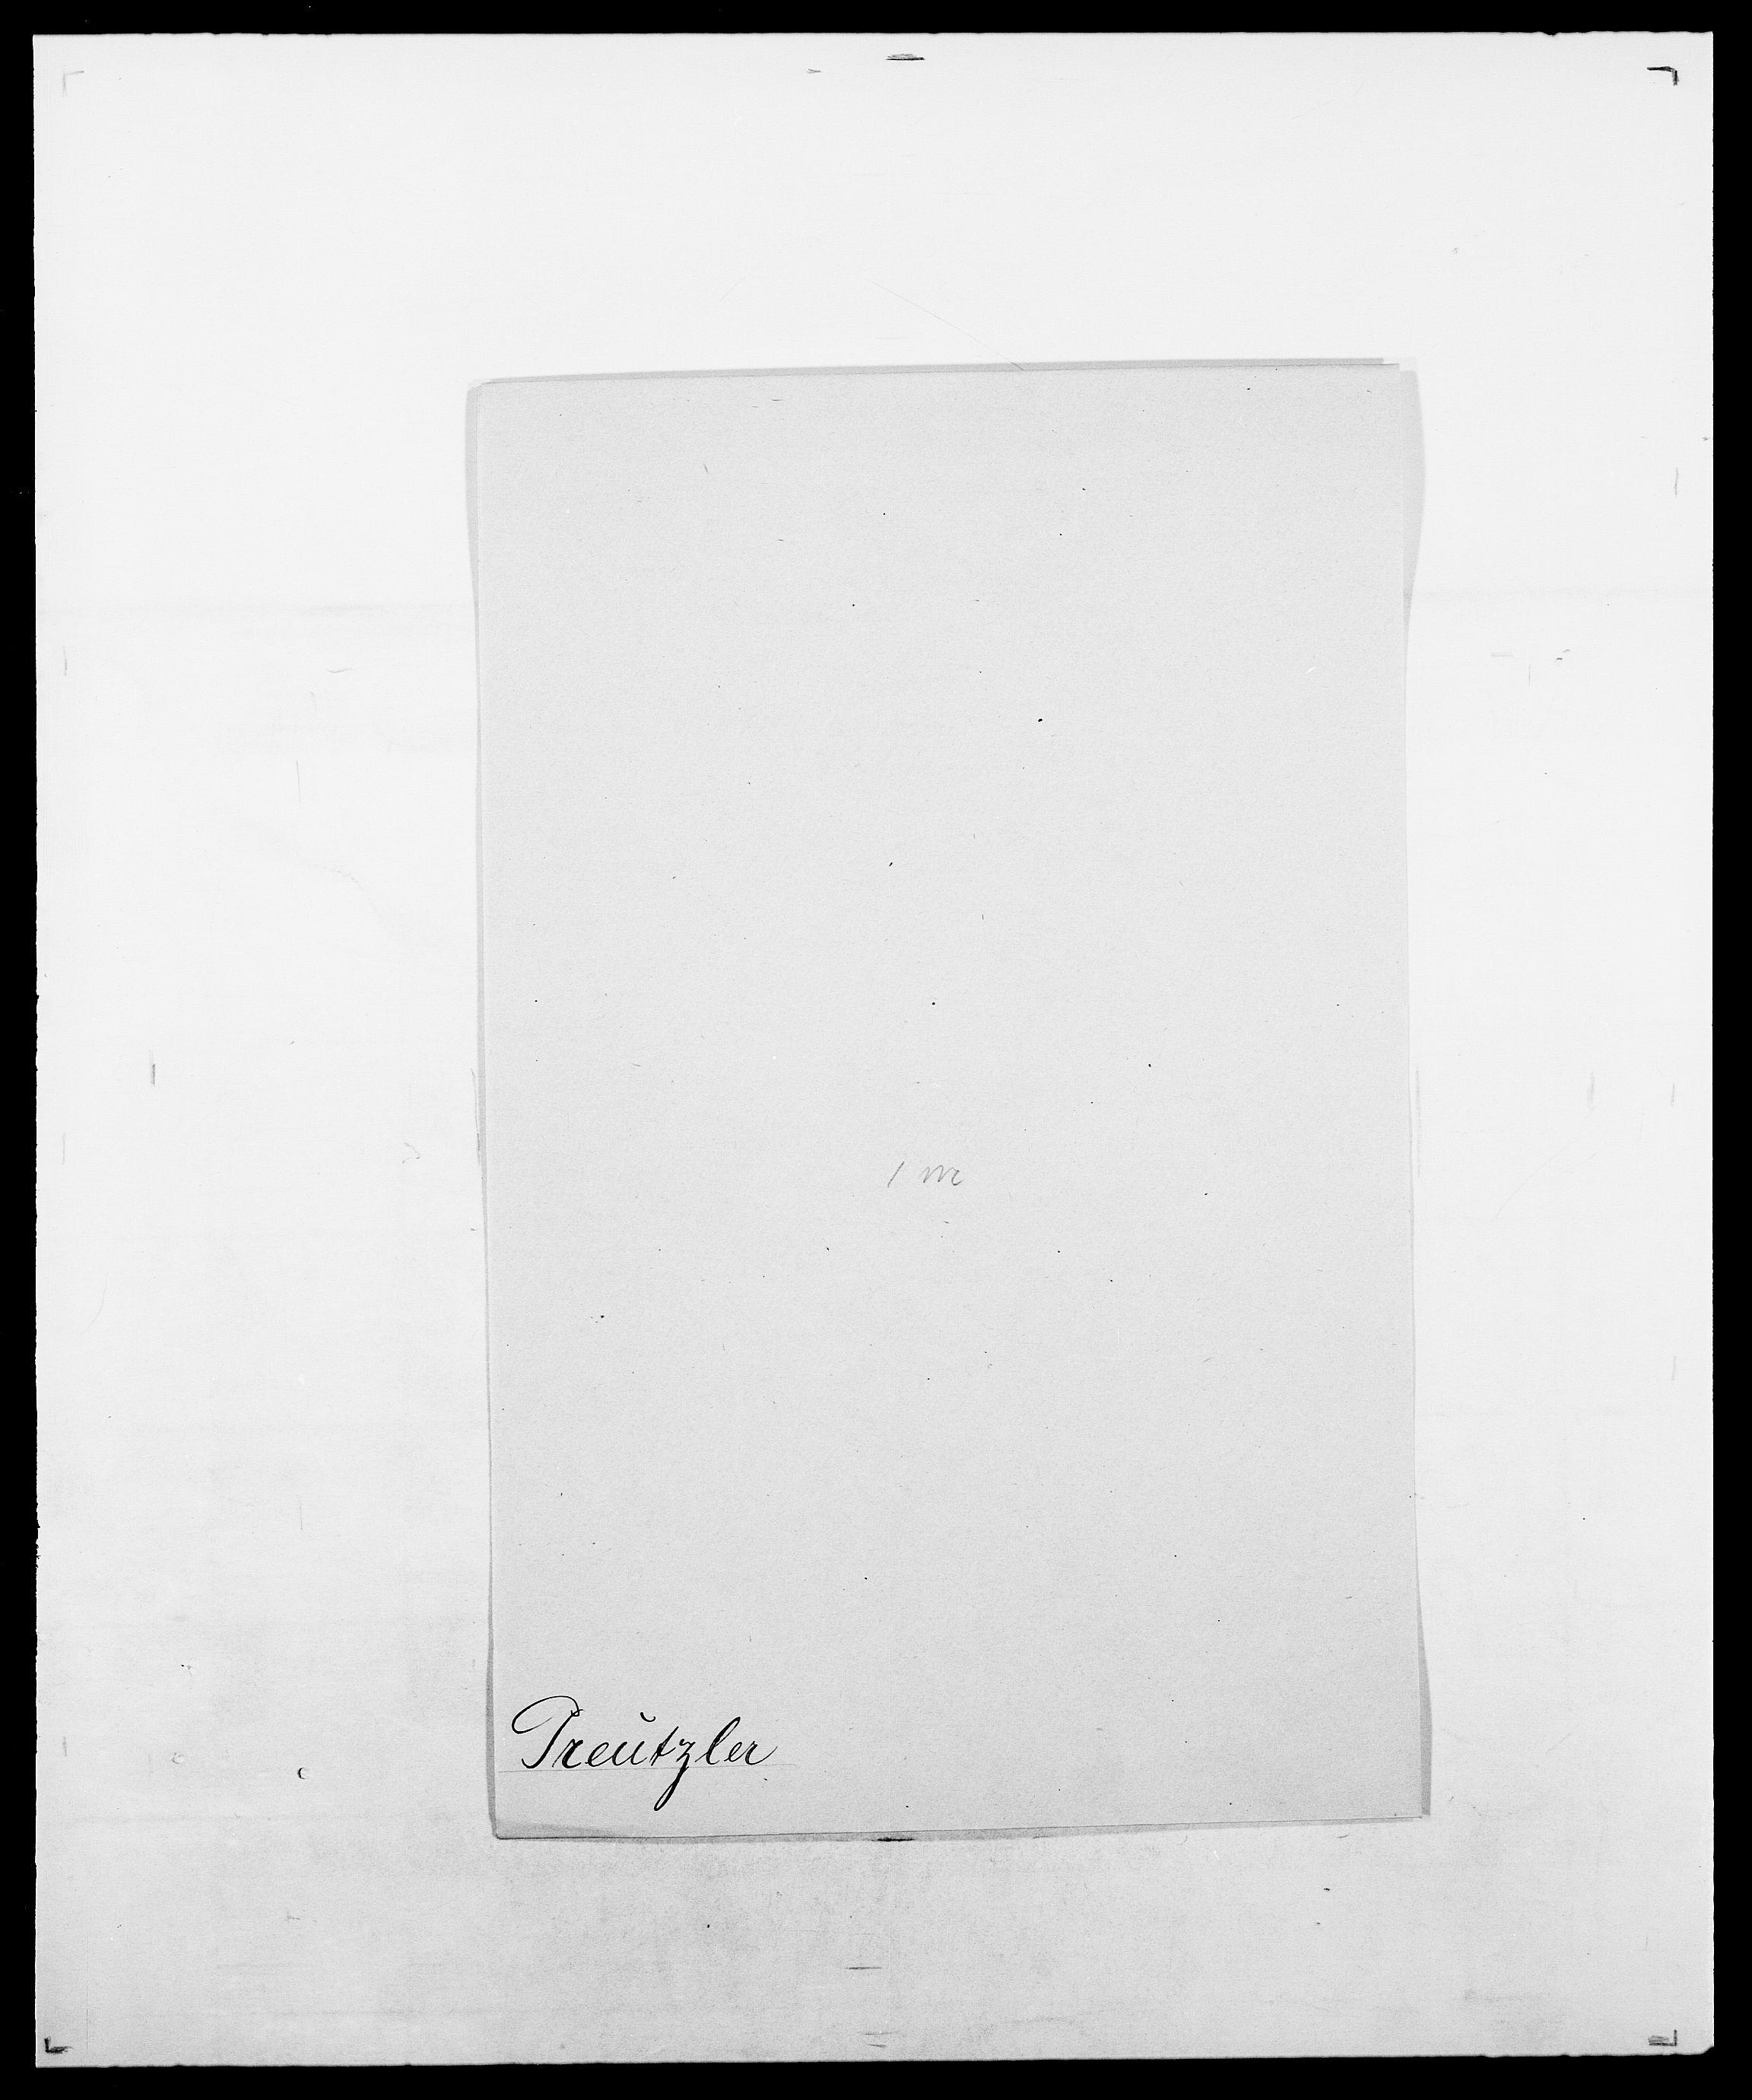 SAO, Delgobe, Charles Antoine - samling, D/Da/L0031: de Place - Raaum, s. 333